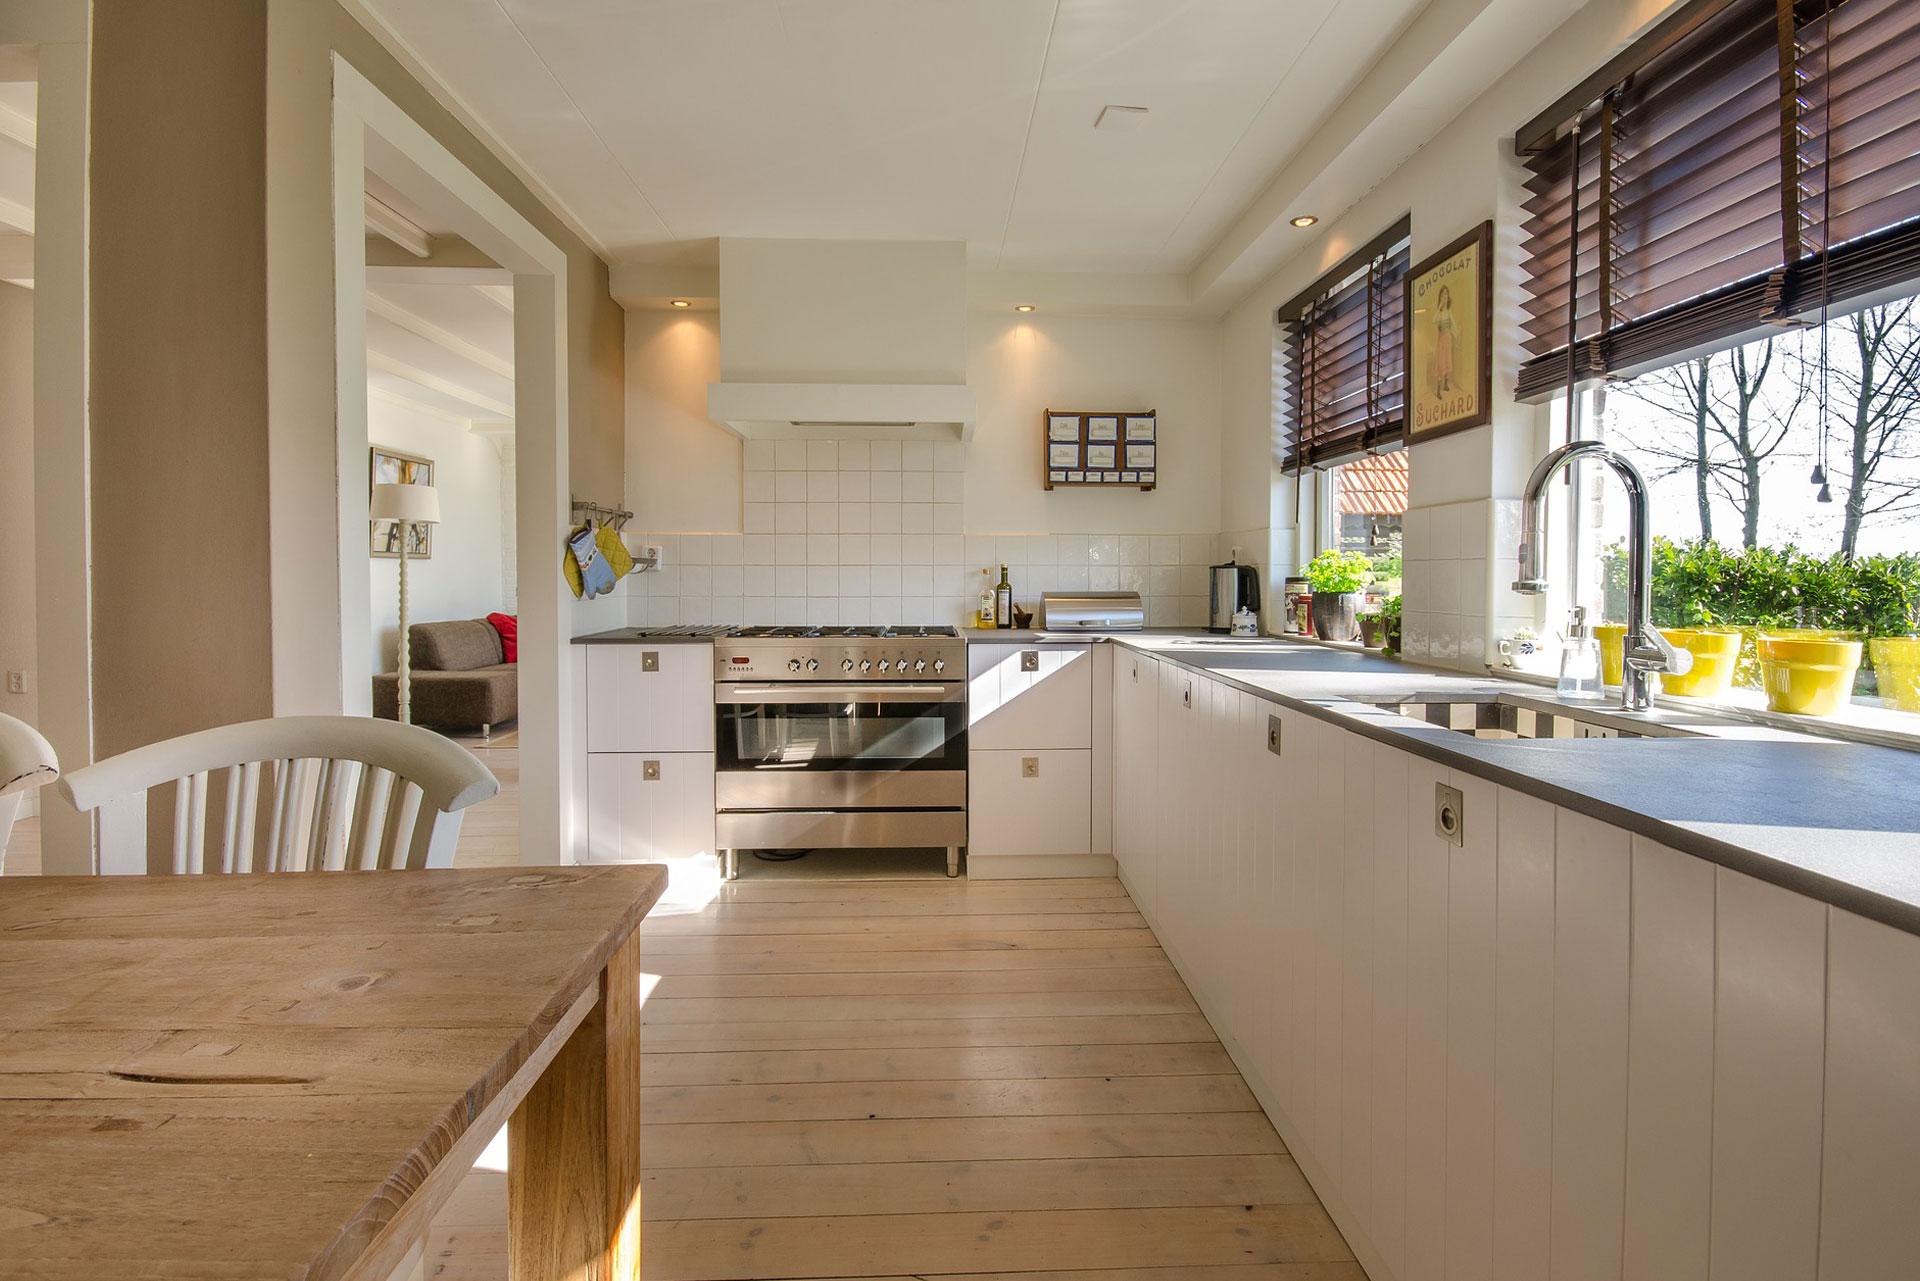 kitchen_granite_countertop.jpg